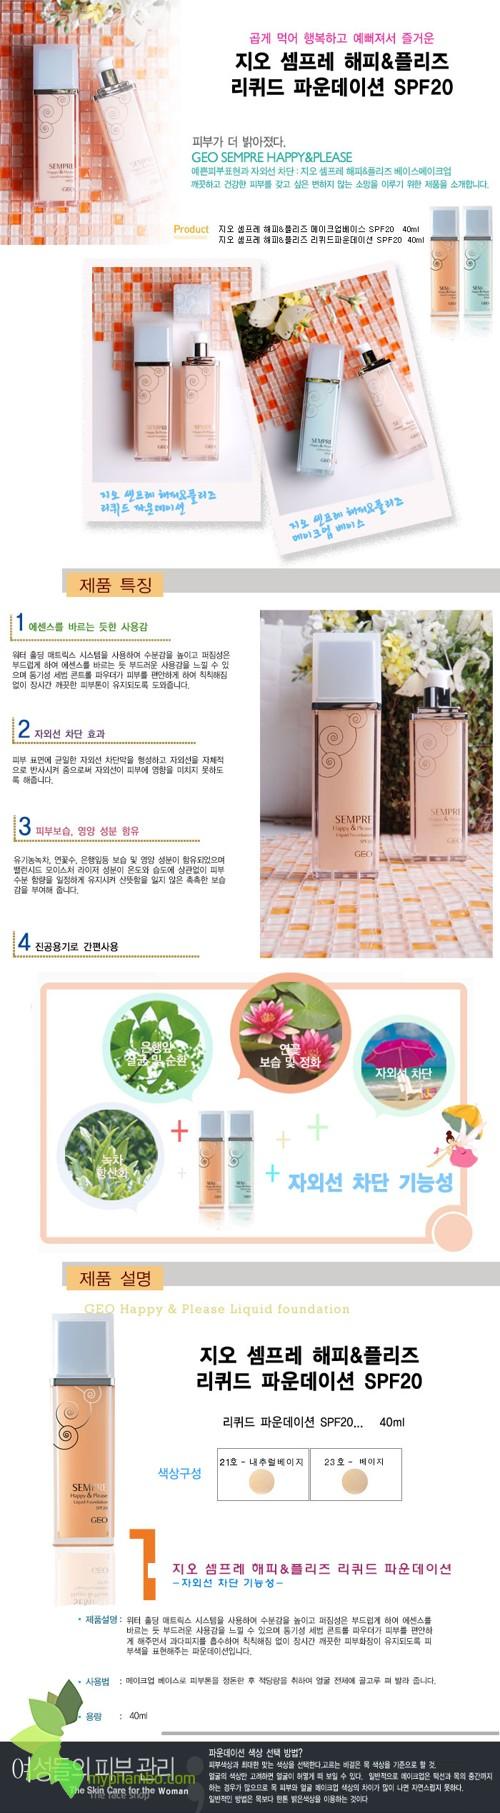 Kem lot nen Geo - Happy Sempre & Please make up base - liquid foundation (1)